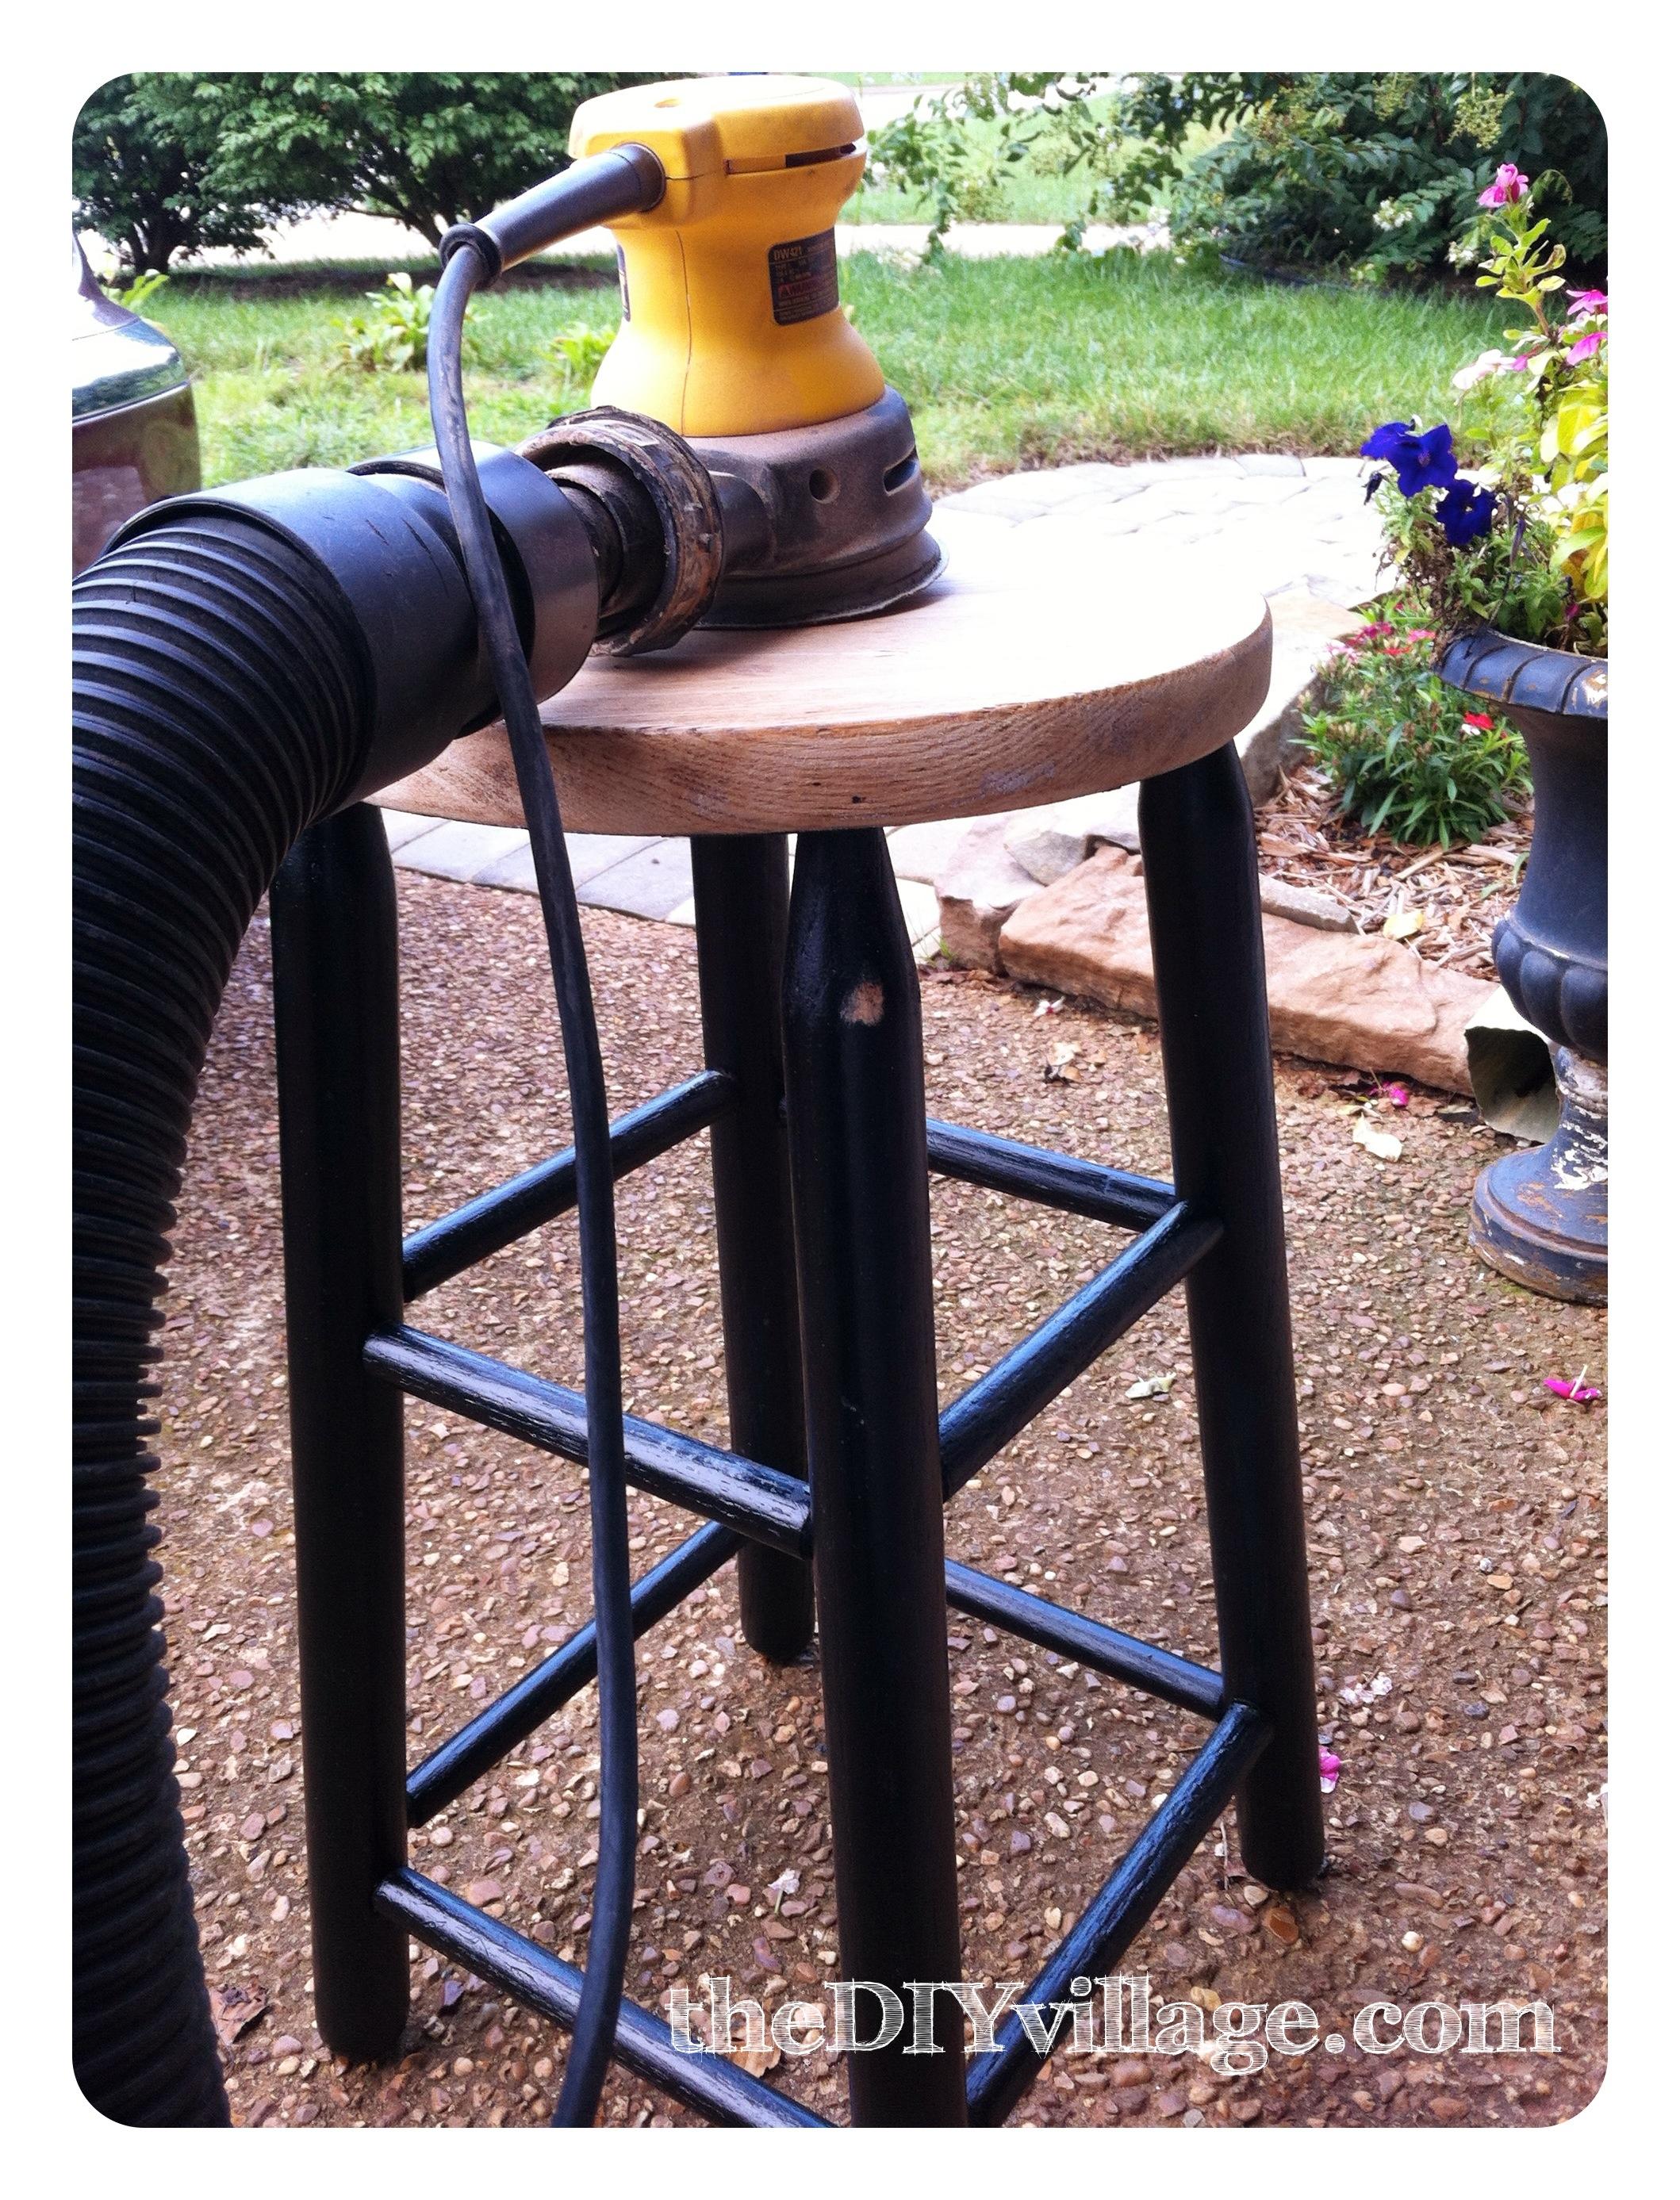 Surprising Vintage Industrial Diy Bar Stools The Diy Village Short Links Chair Design For Home Short Linksinfo